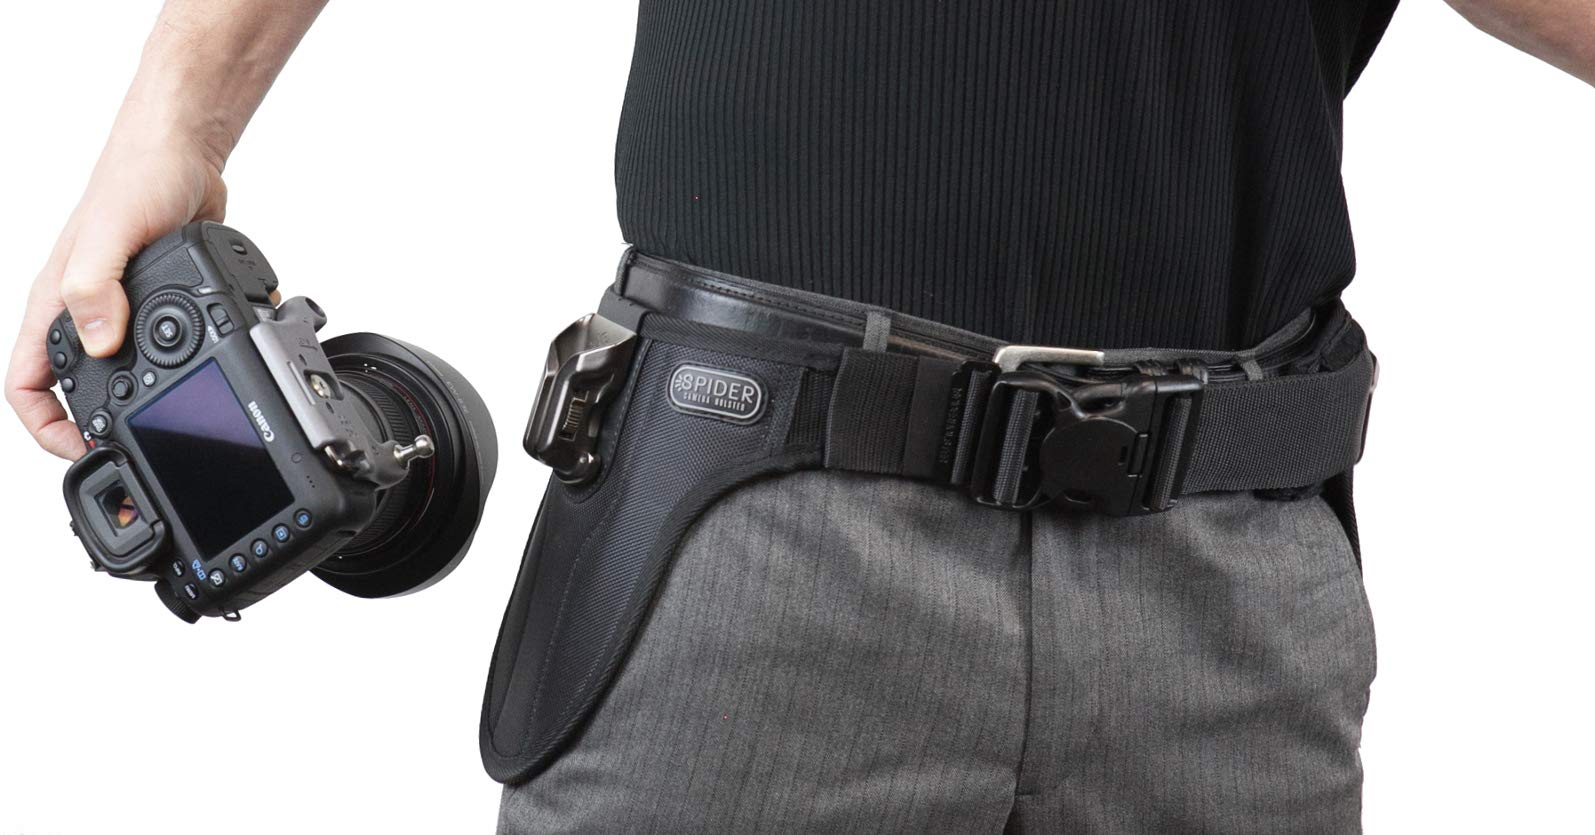 Spider Camera Holster SpiderPro Single Camera System v2 (SCS) with Leather SpiderPro Hand/Wrist Strap Bundle by SpiderHolster (Image #5)